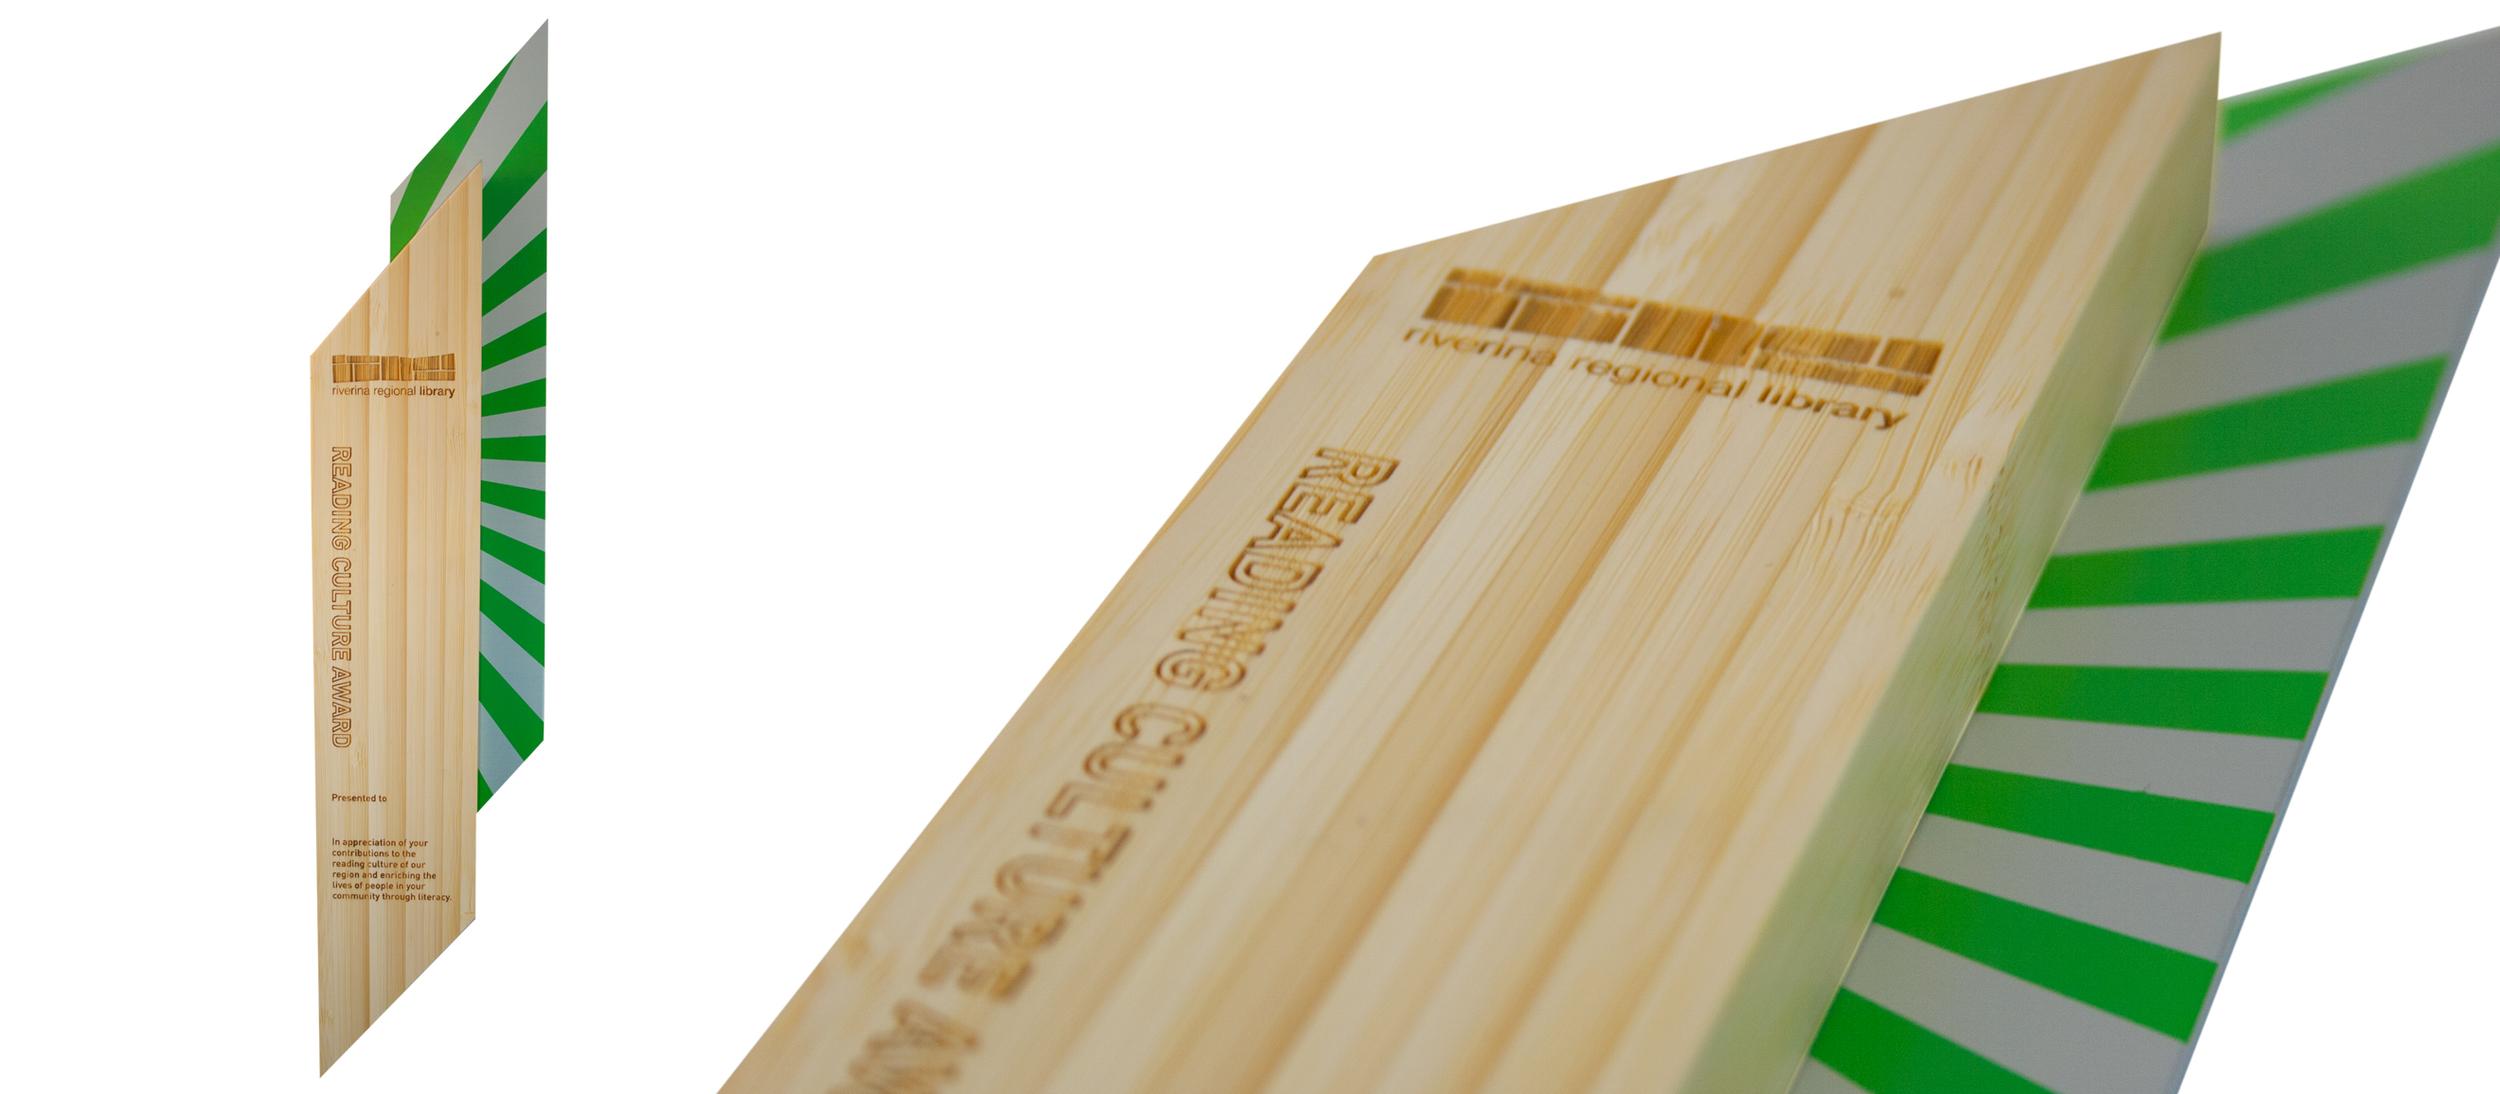 riverine regional library - eco-friendly bamboo, modern plaque design